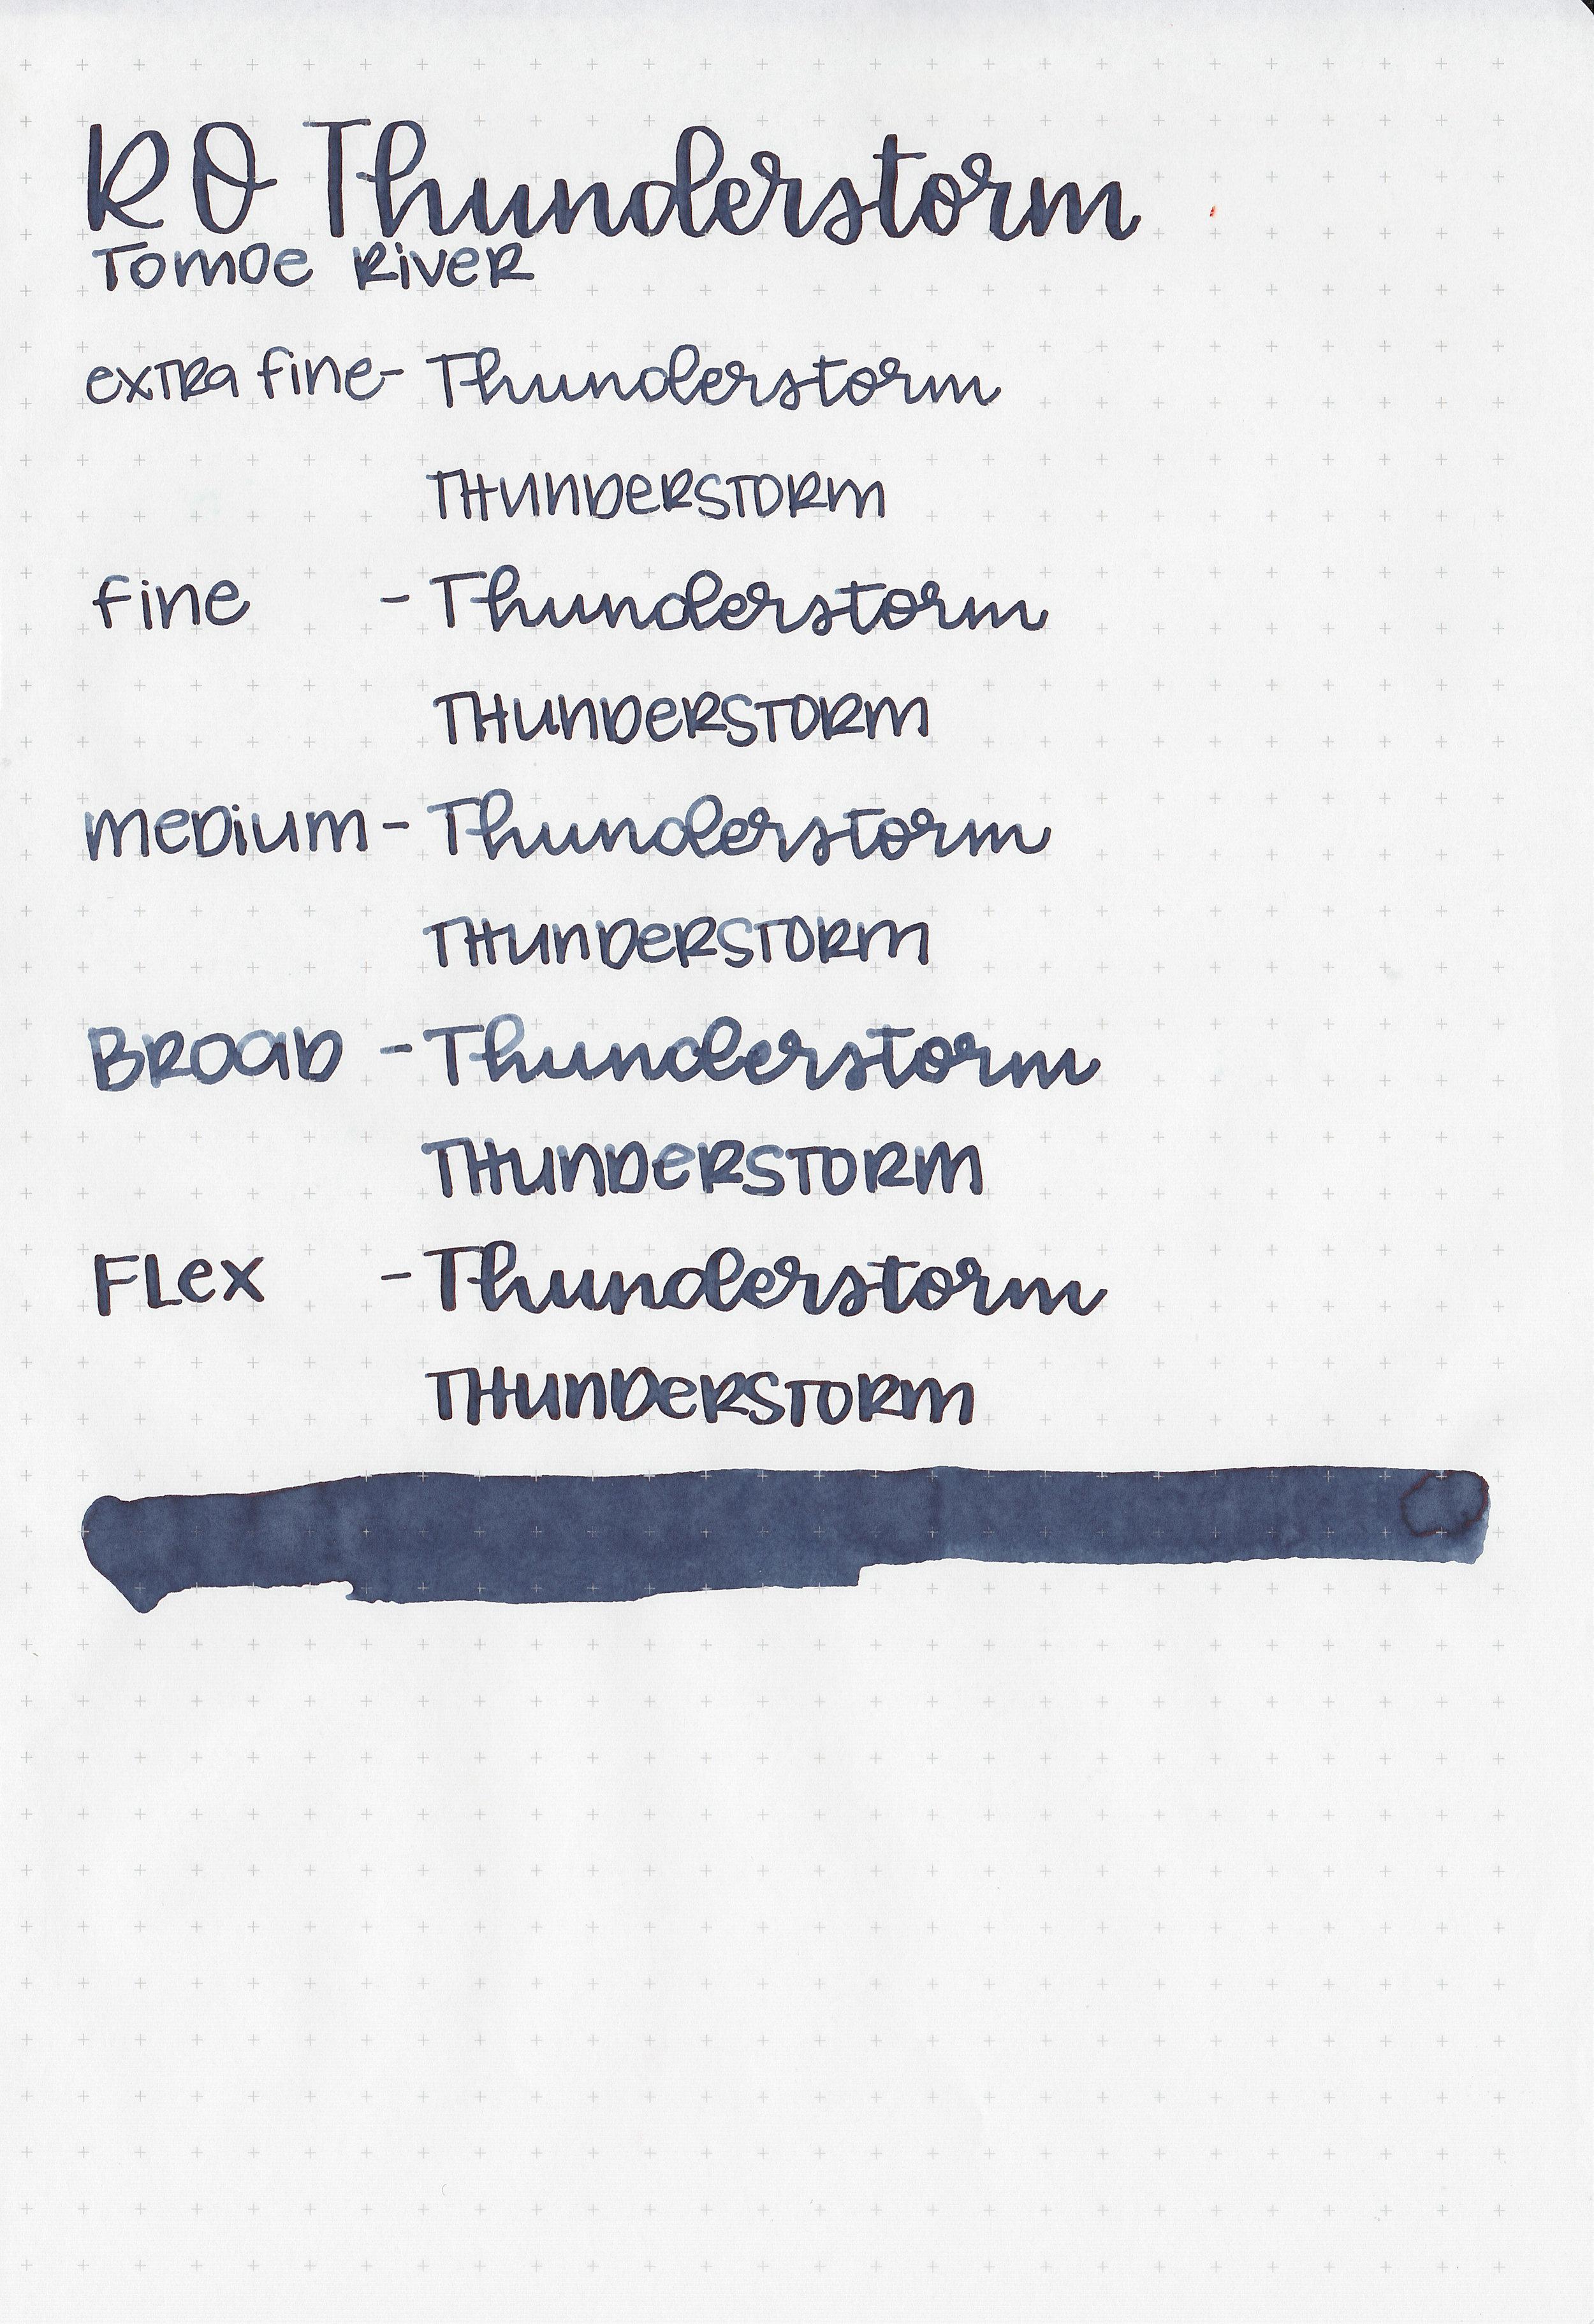 ro-thunderstorm-8.jpg